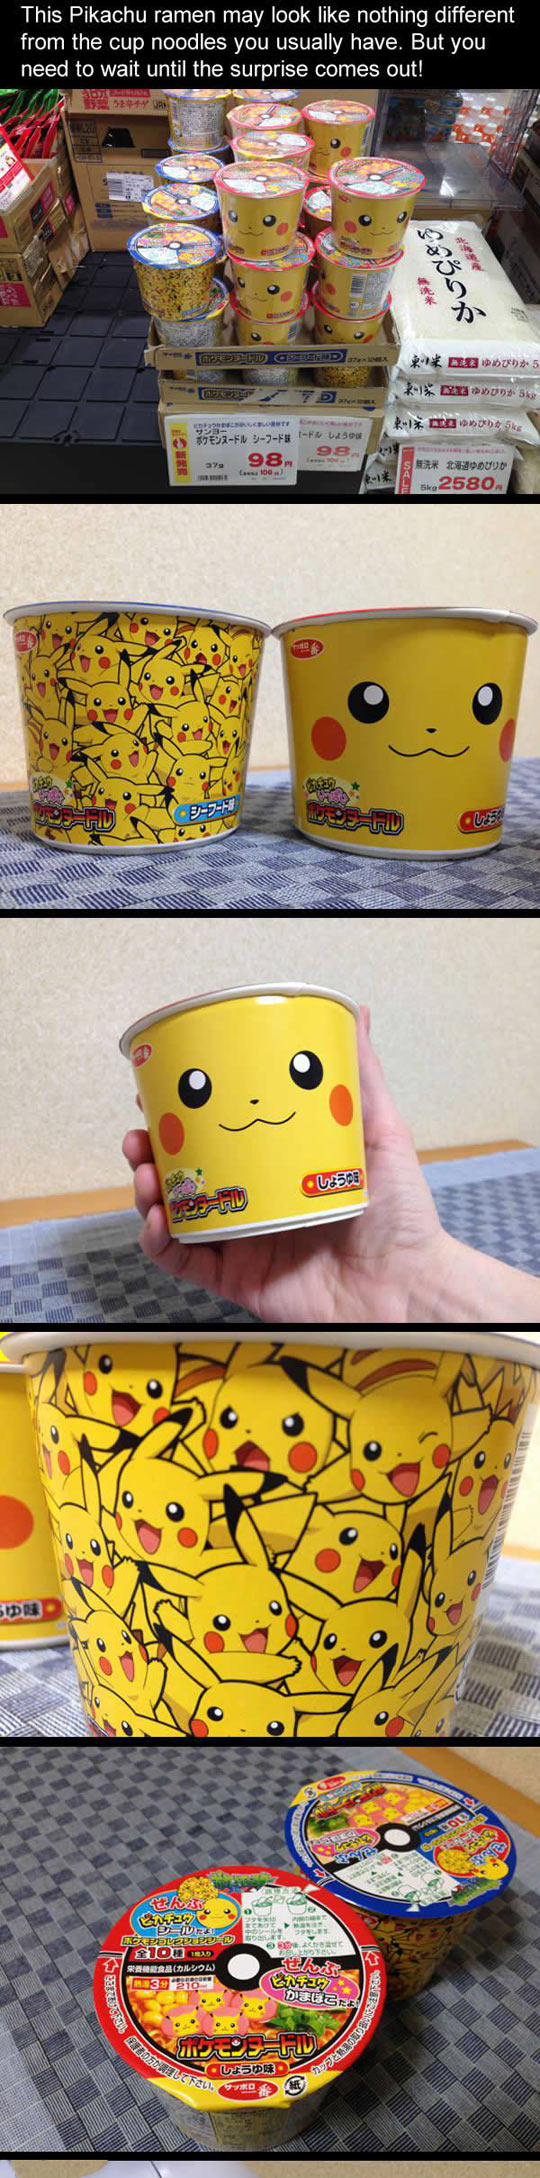 funny-noddle-Pikachu-Ramen-soup